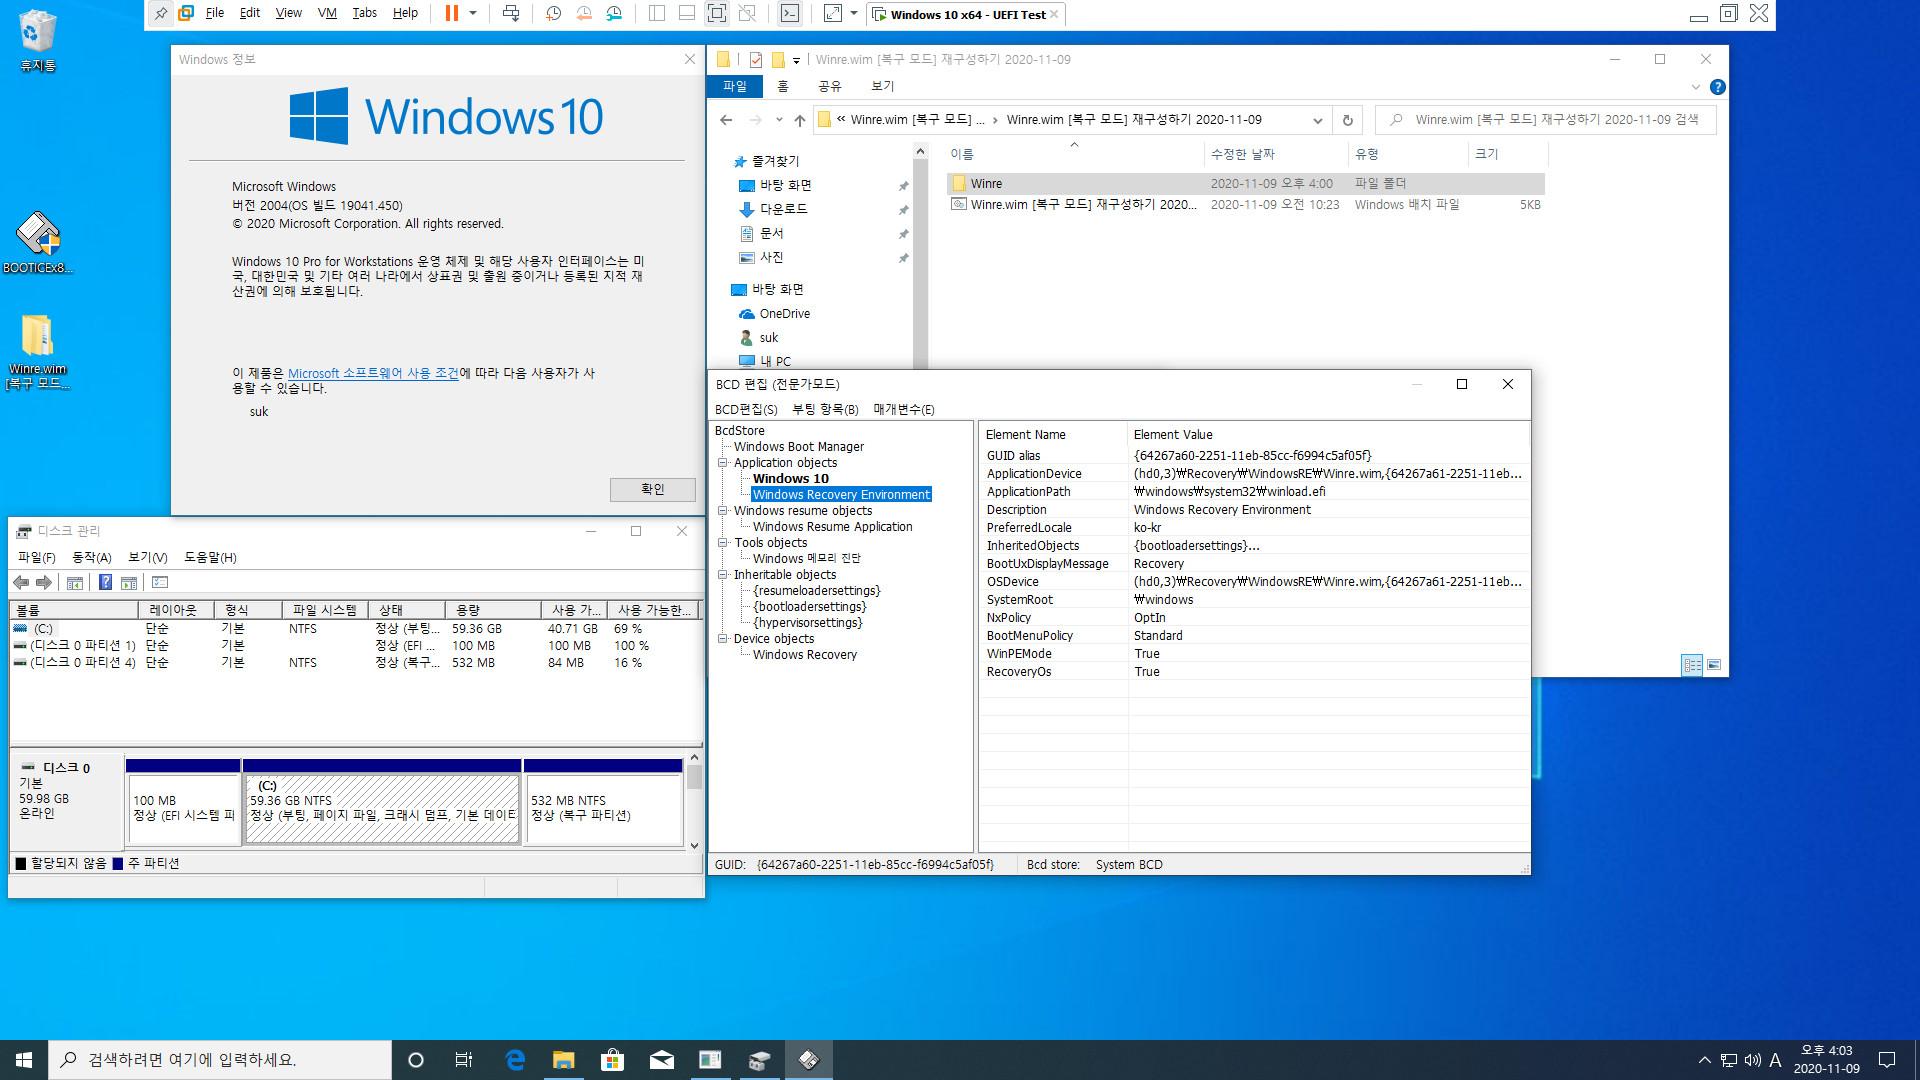 Winre.wim [복구 모드] 재구성하기 2020-11-09.bat 테스트 - PE를 winre.wim으로 사용하기 - 버전 2004 정식 UEFI 모드로 윈도우 설치 직후 상황 2020-11-09_160318.jpg